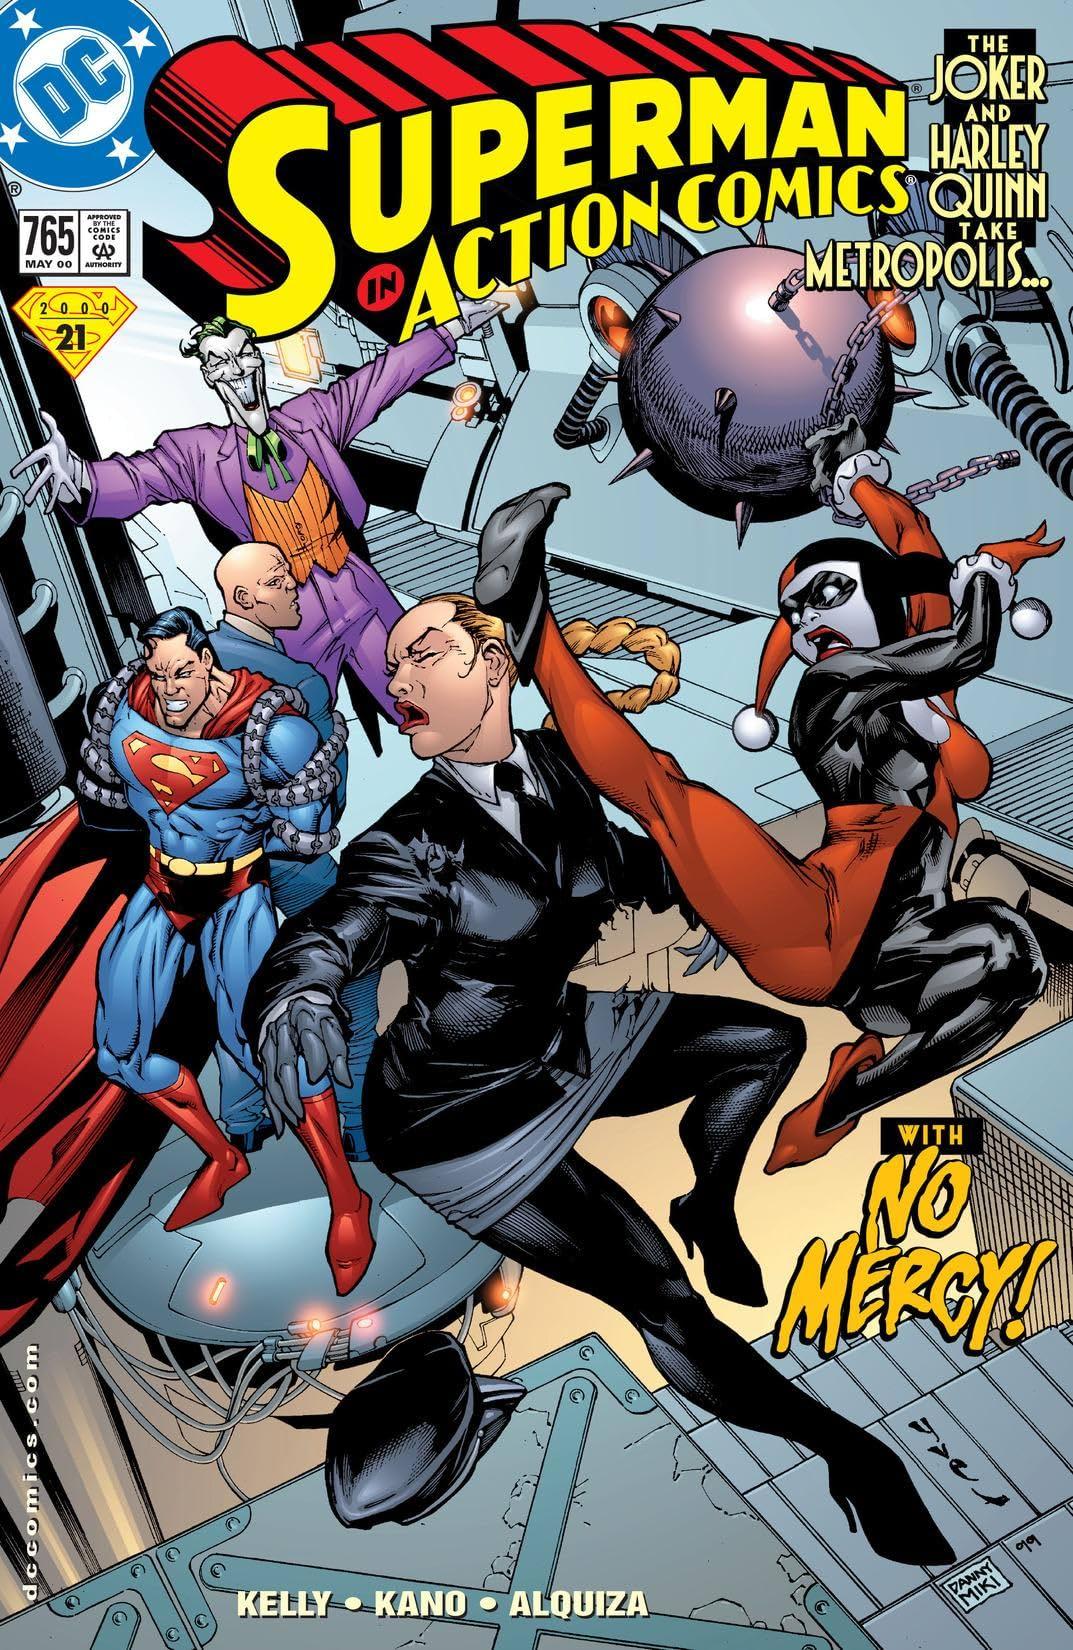 Action Comics (1938-2011) #765